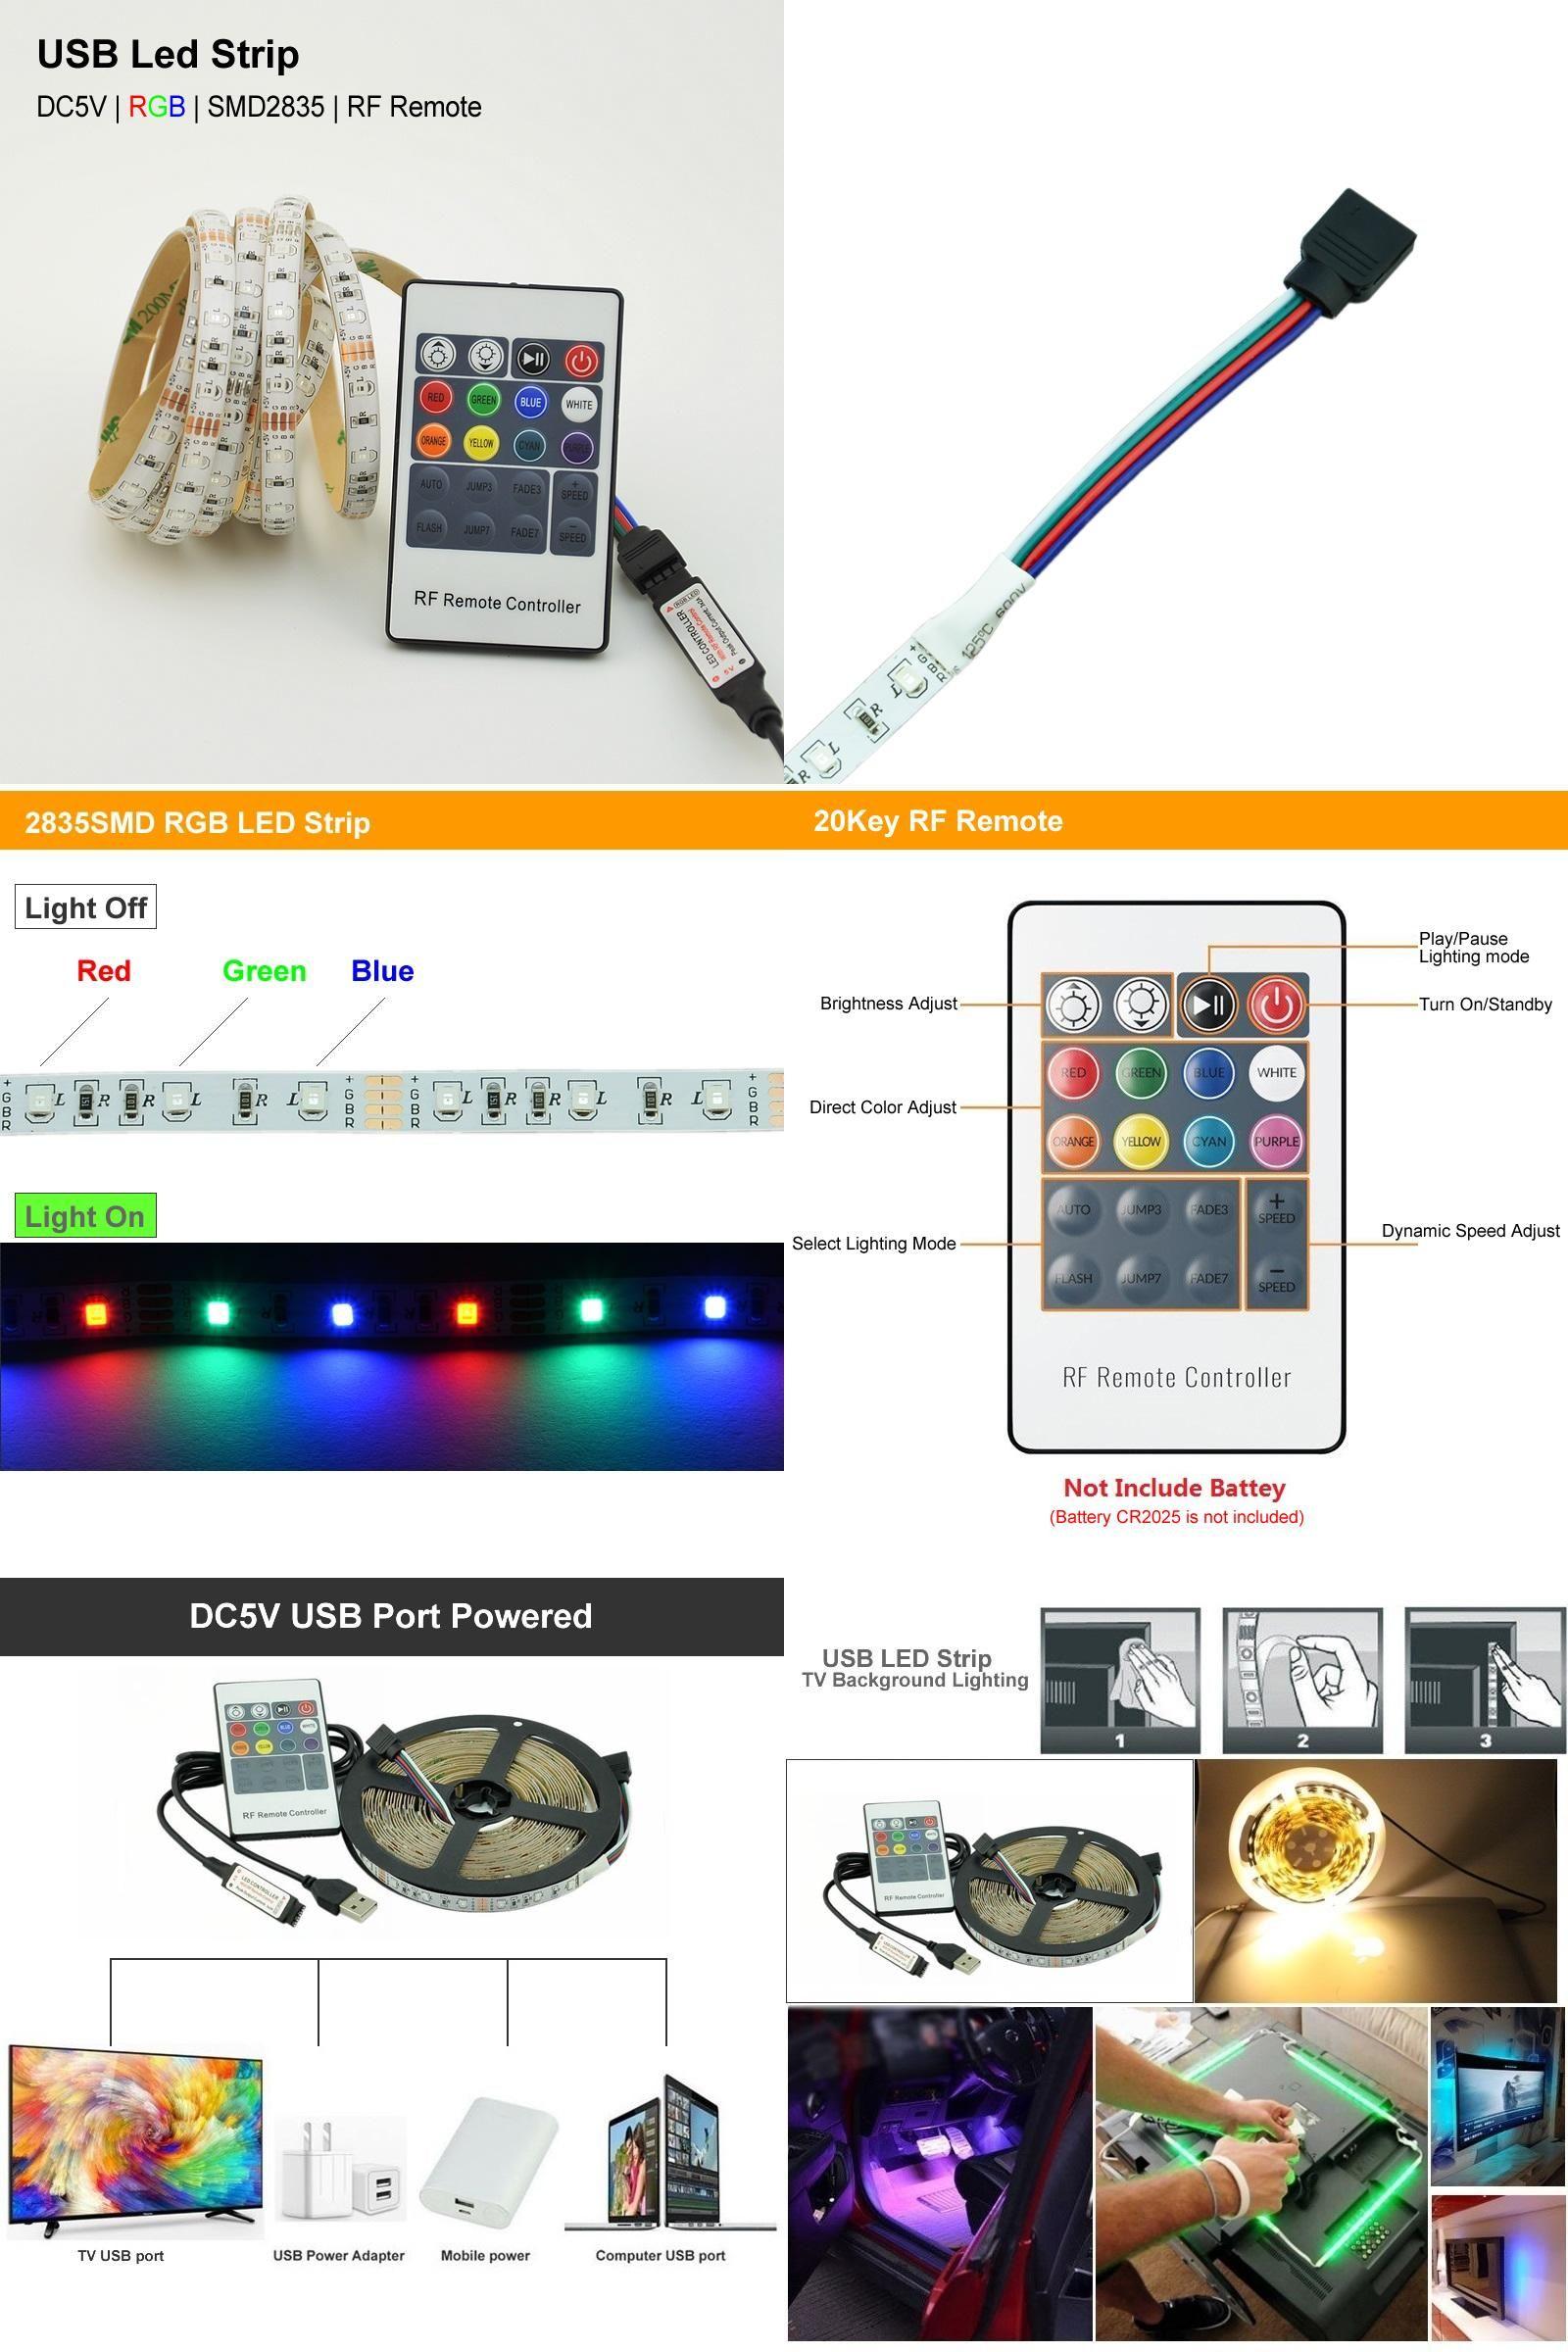 Visit to Buy RGB LED STRIP USB Colour Changing Lighting Kit cm M